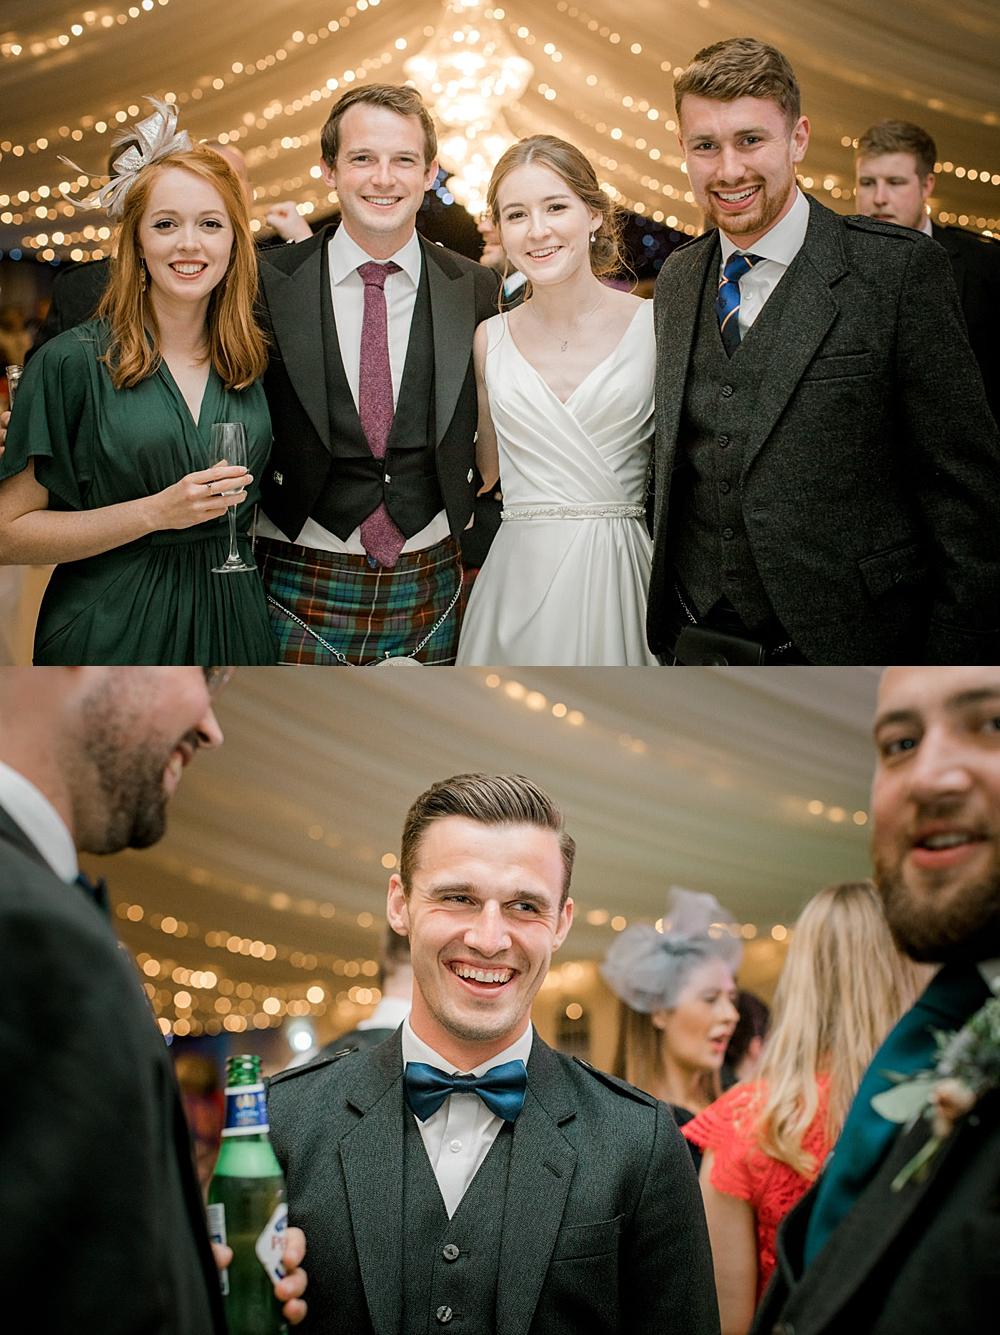 Scottish weddings dancing & fun 0043.jpg